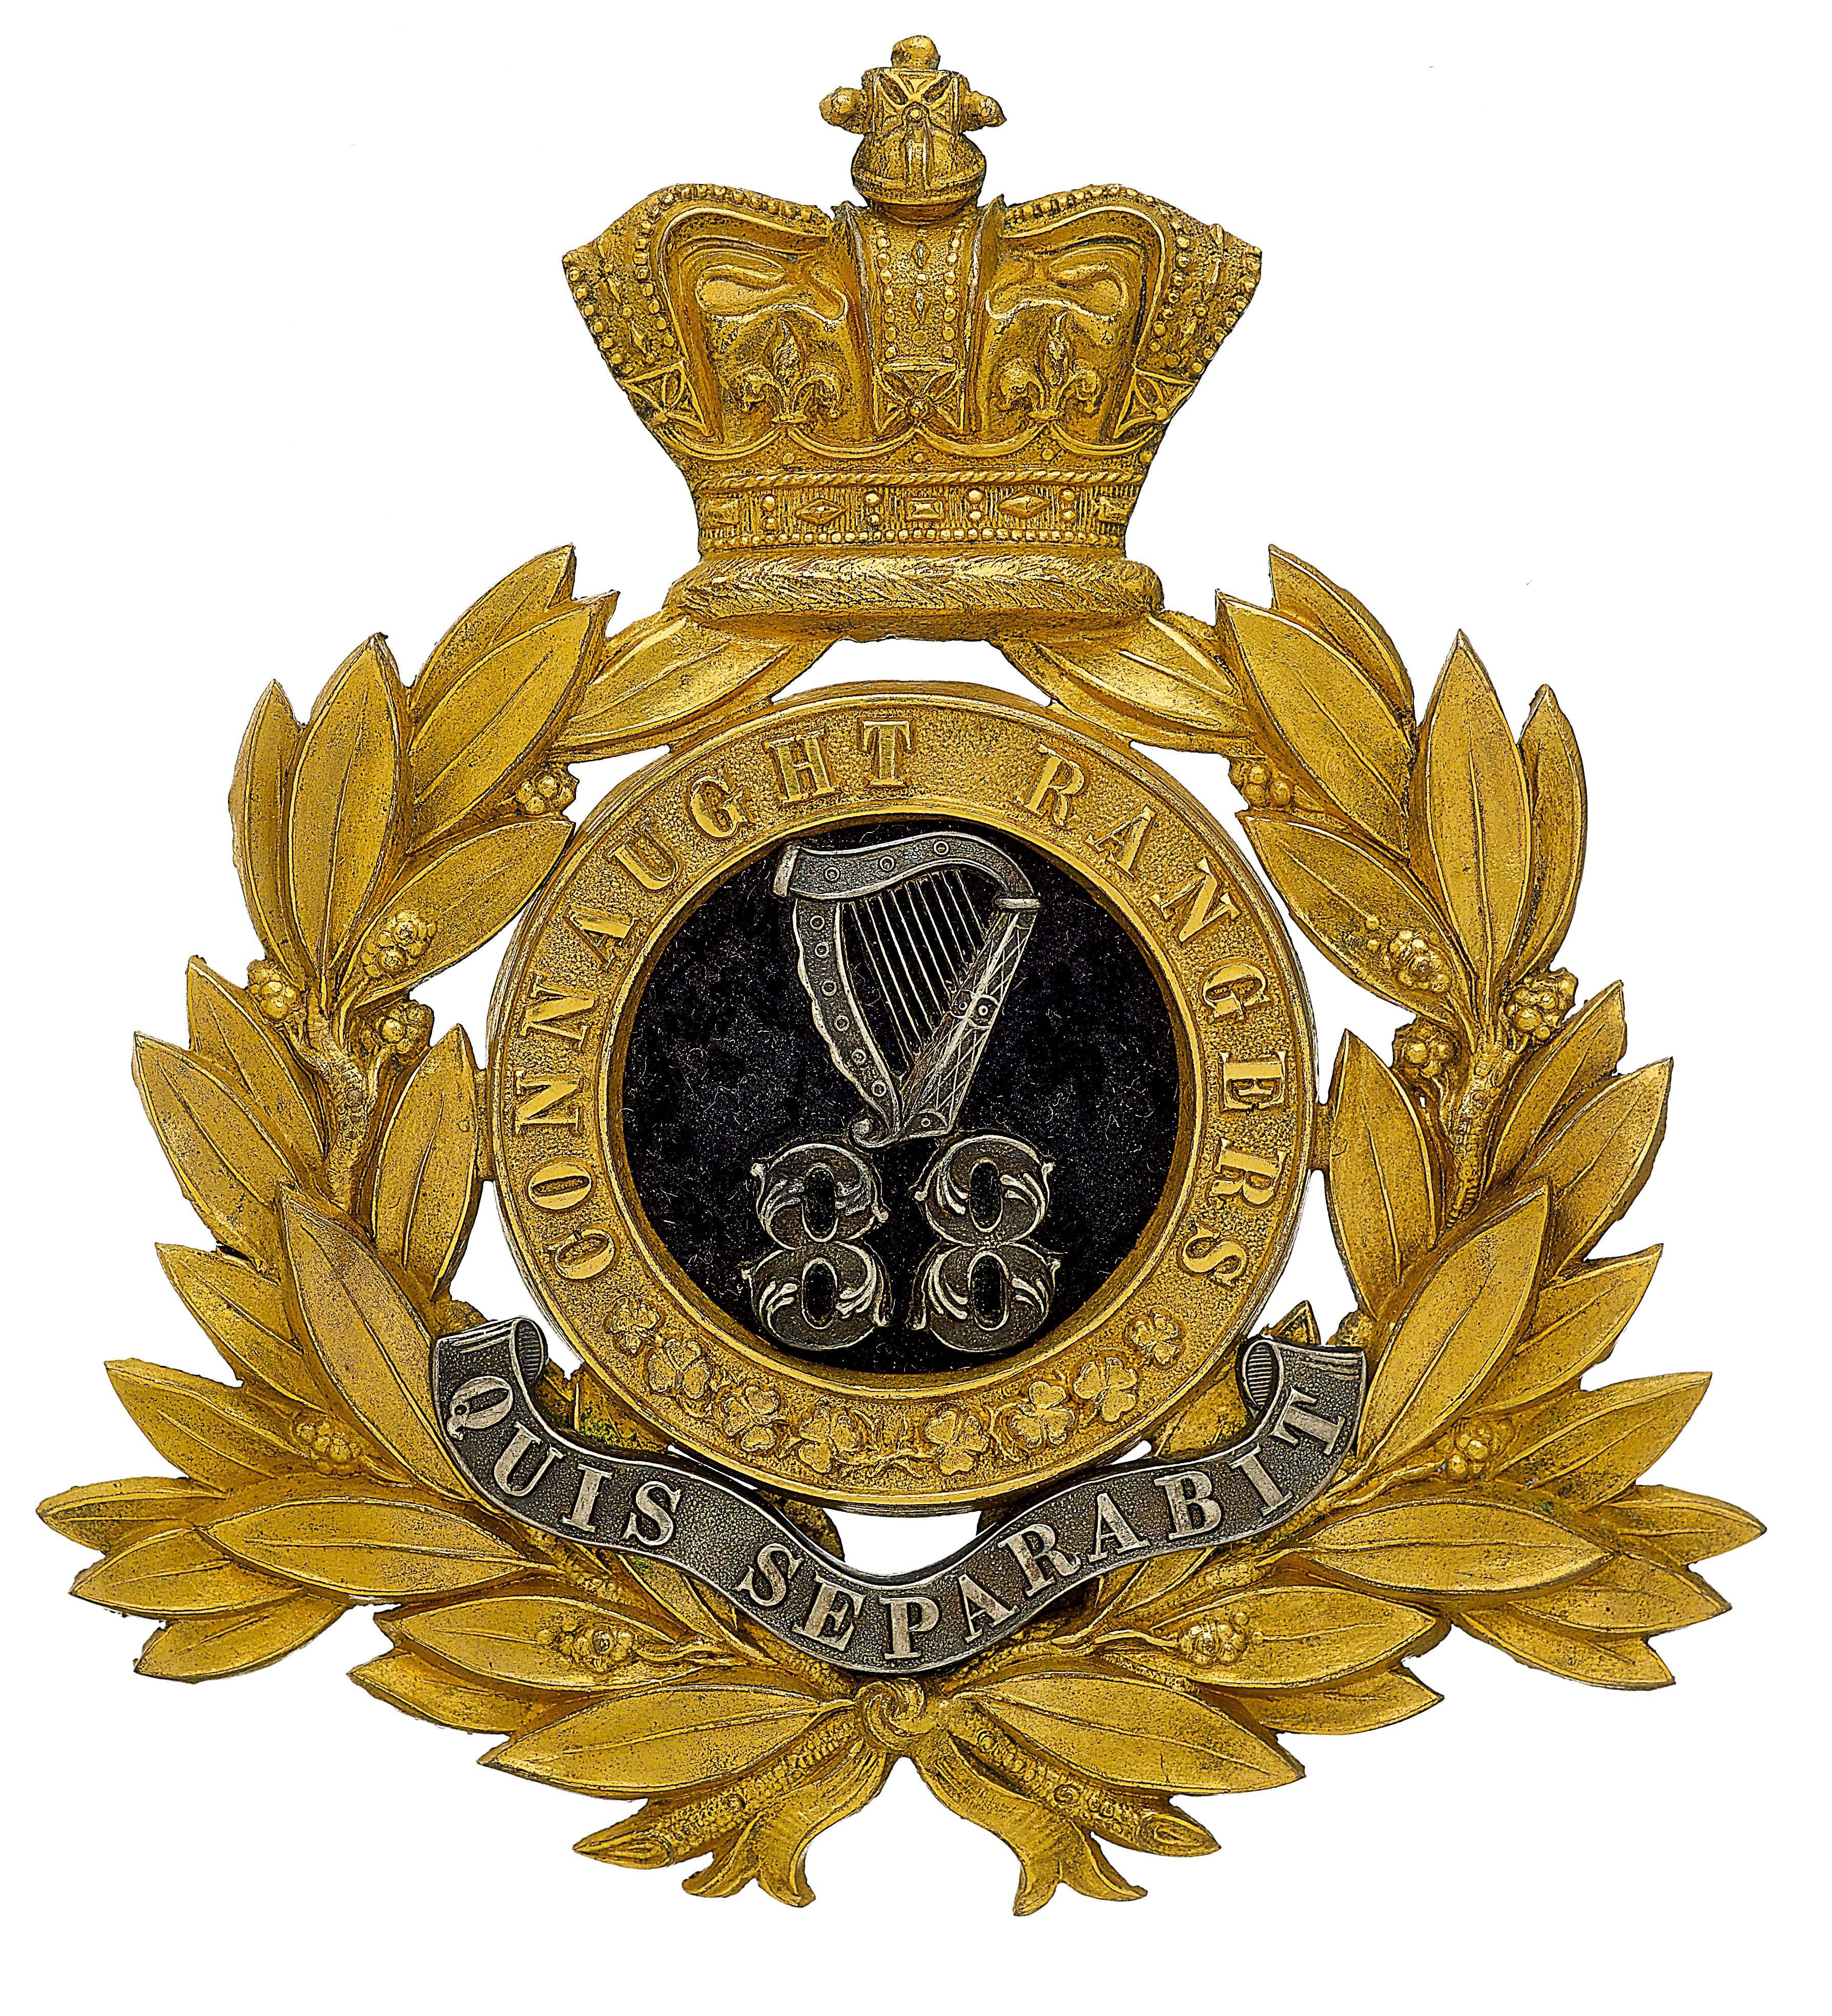 Connaught Rangers British Army Pin Insignia